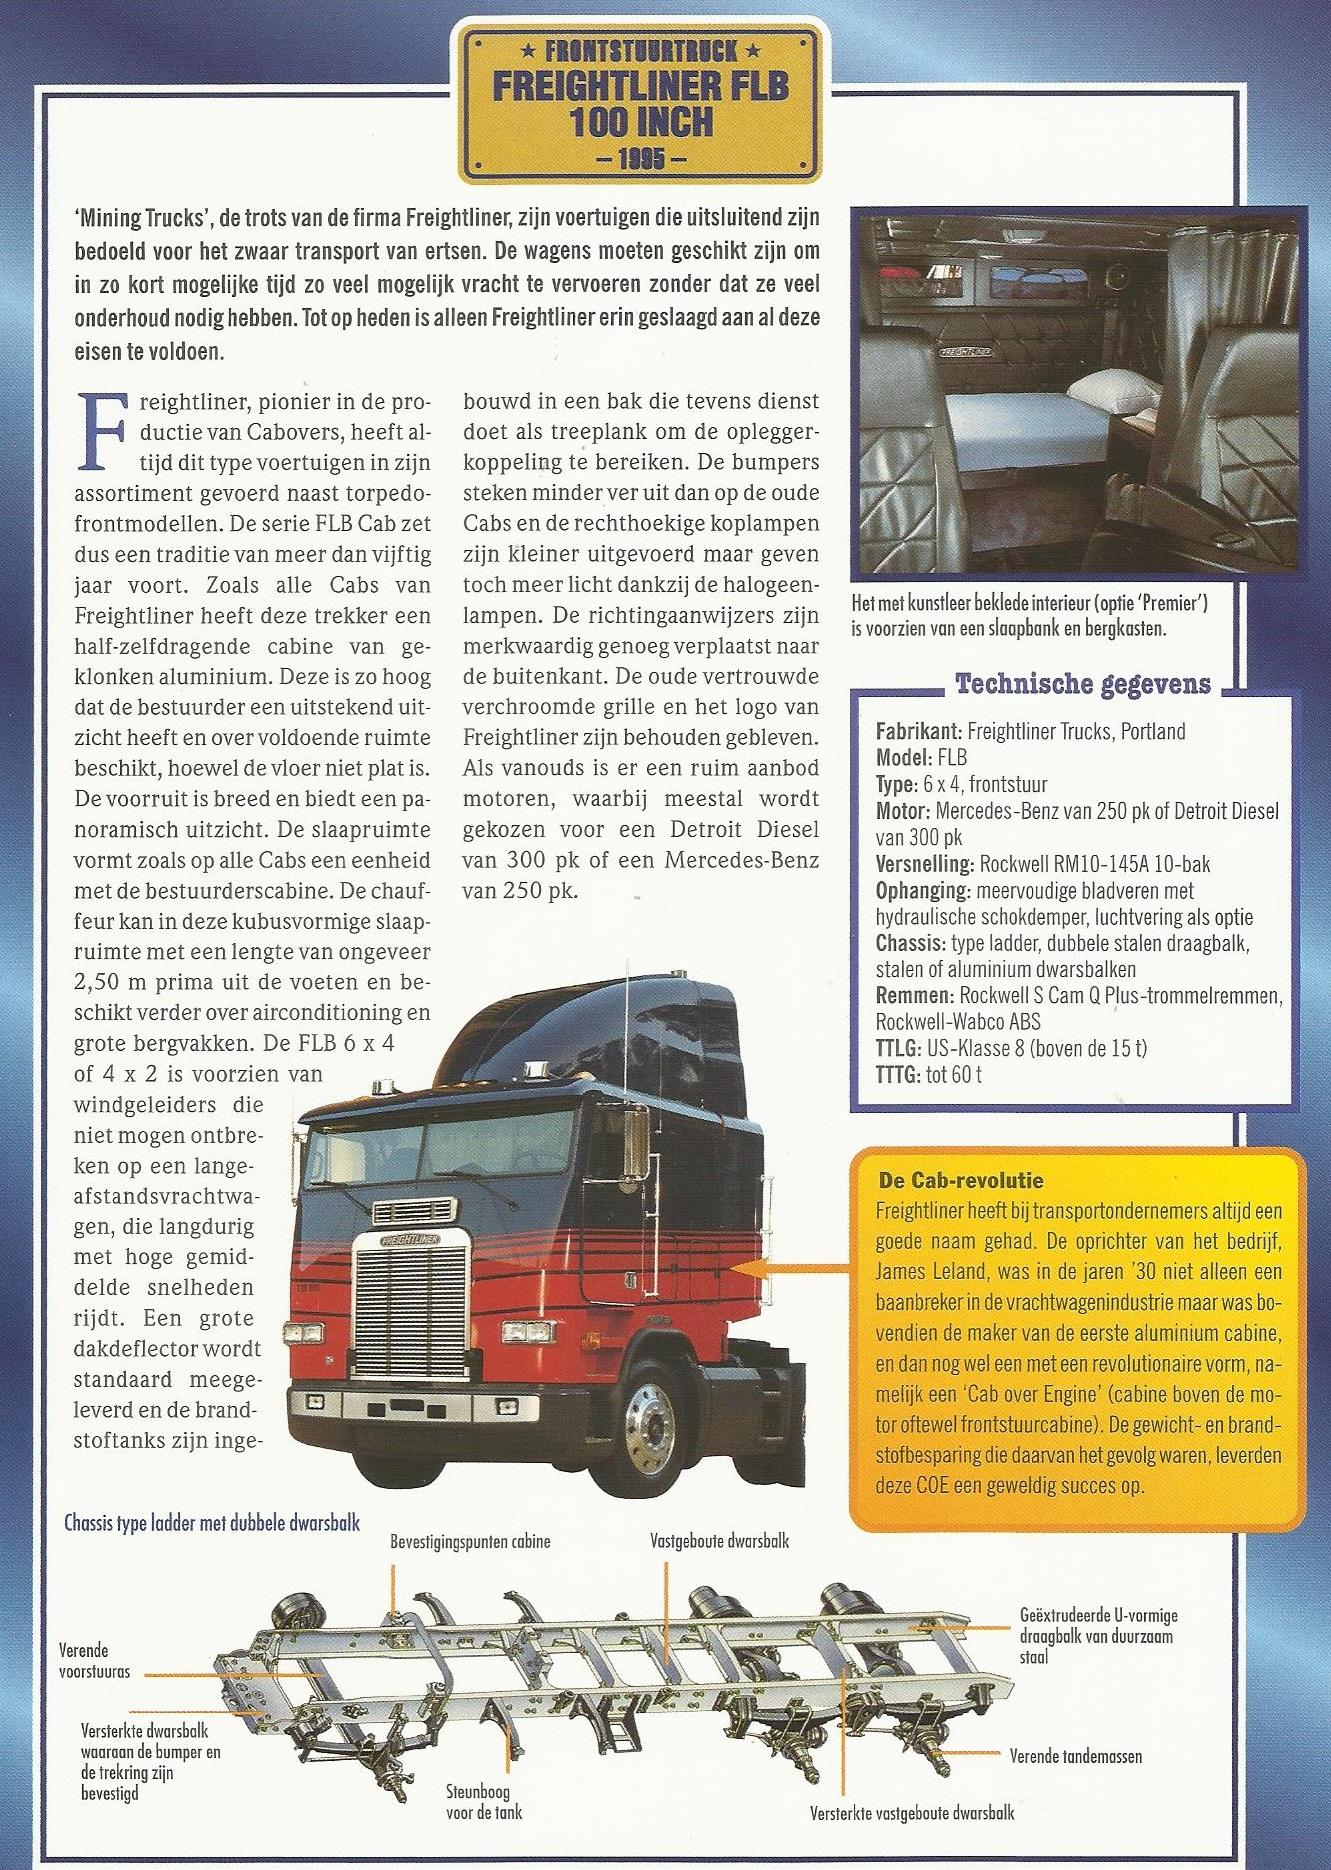 Freightliner-1-002